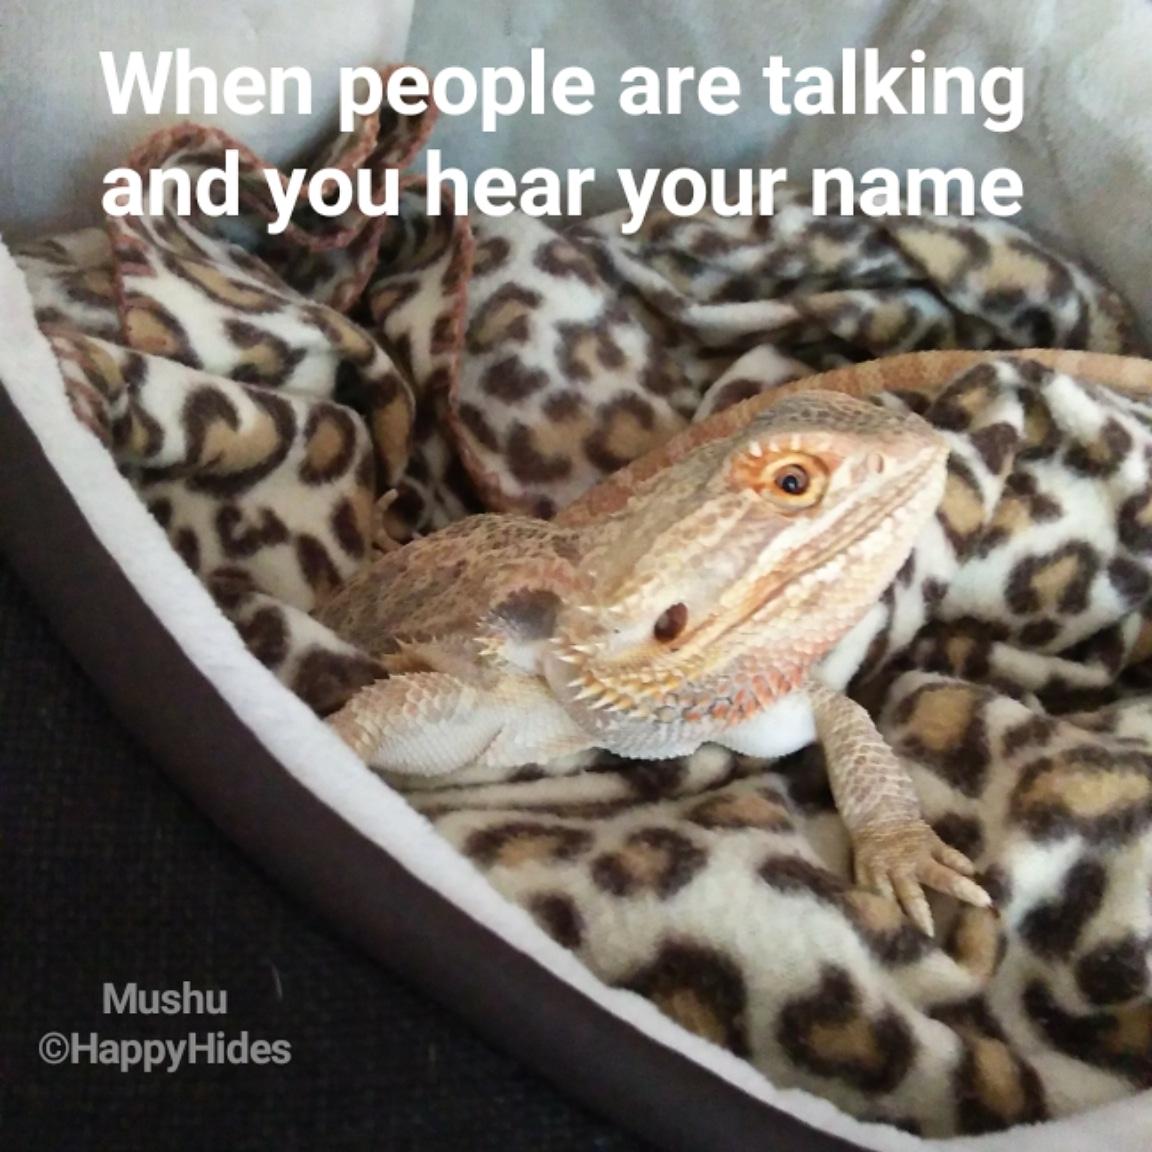 I'll just pretend I'm not listening😳 #WaterCoolerTalk #coworker #Friday #friyay #FridayThoughts #work #fridaymood #HappyHides #beardeddragon #beardeddragons #beardie #beardies #reptile #reptiles #rescue #reptilerescue #rescuelife #thedodo #buzzfeedanimals #animals #animaladdicts